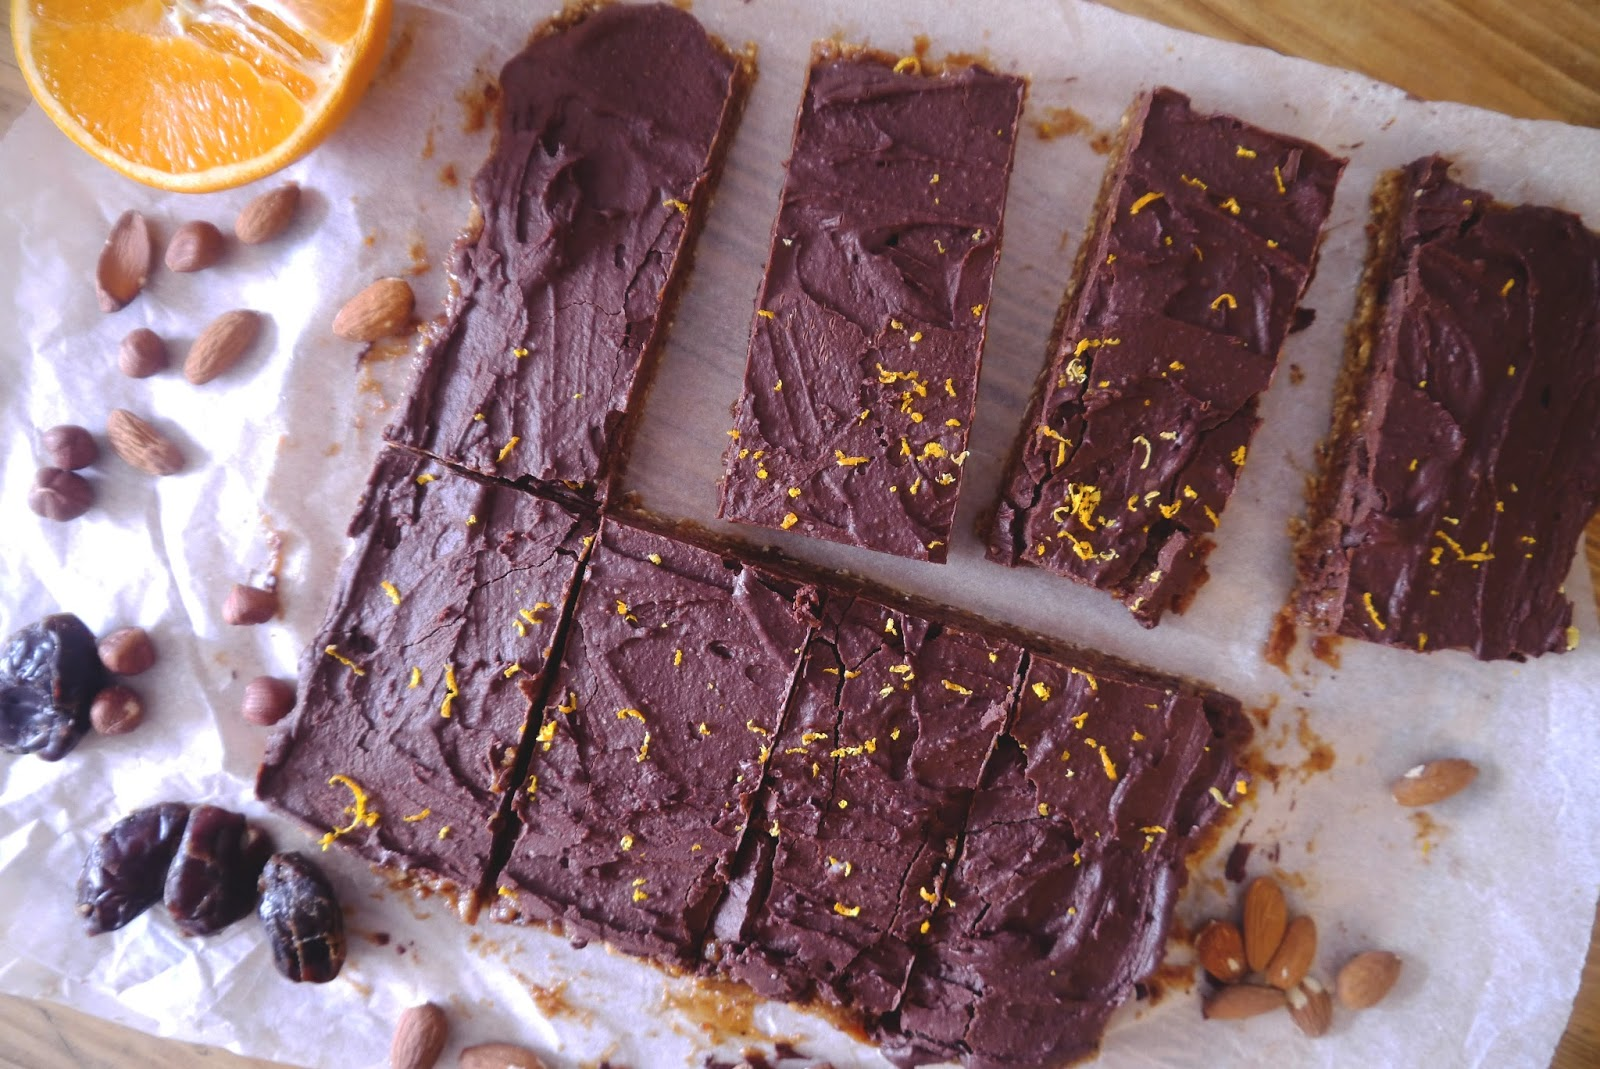 raw chocolate, cacao powder, healthy millionaires shortbread